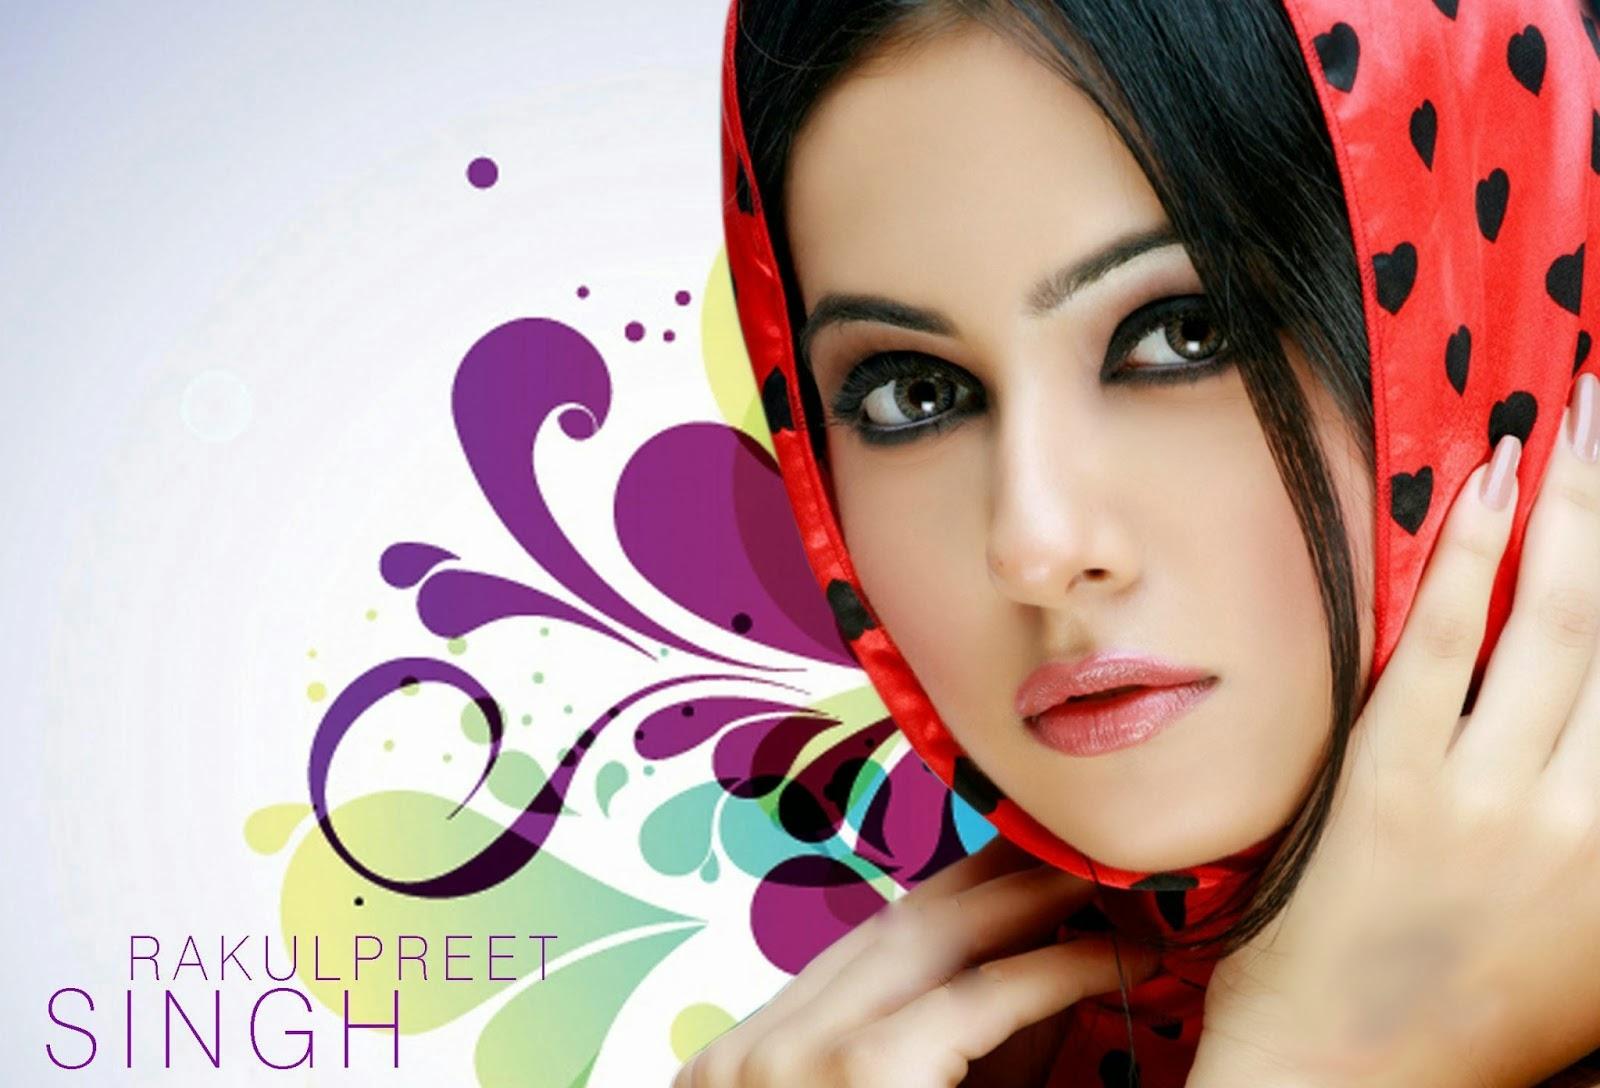 South Indian Hot Girl Rakul Preet Singh Beautiful HQ HD Wallpapers